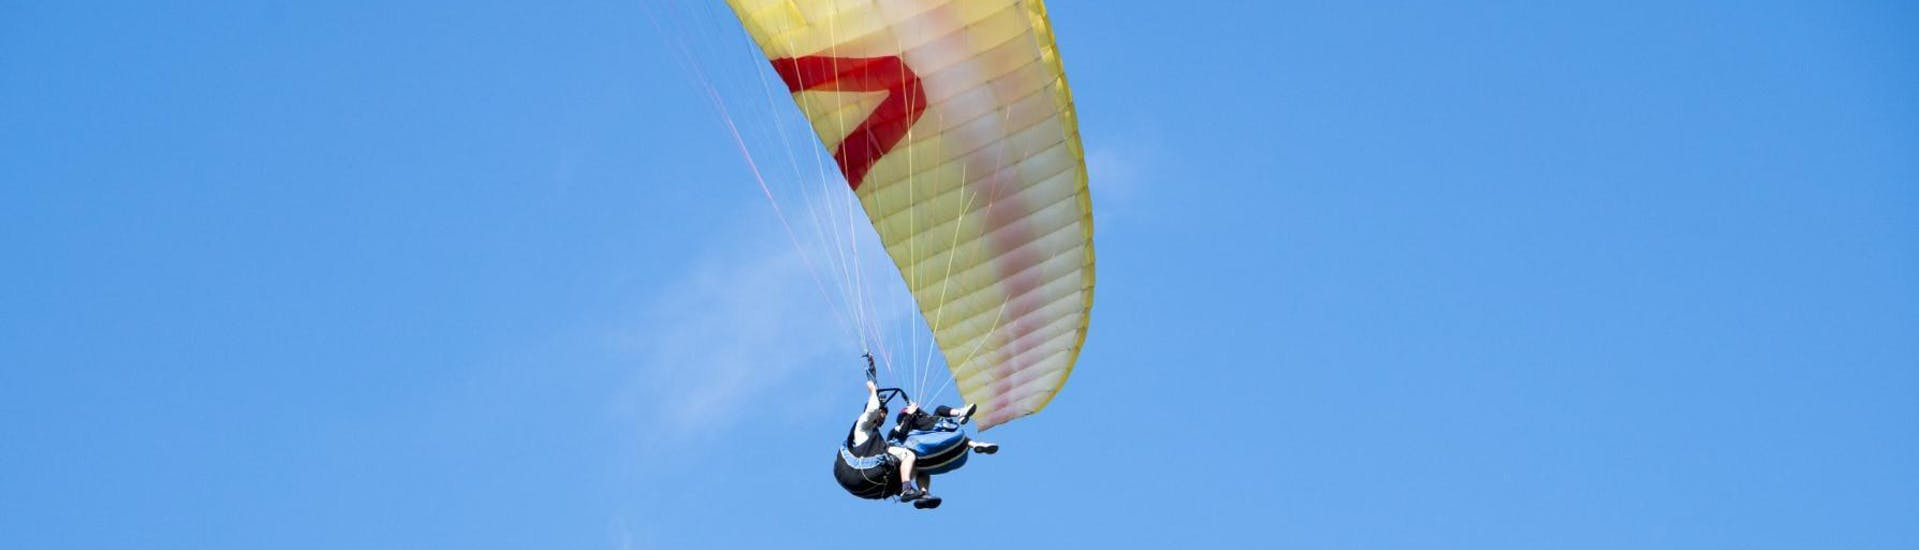 thermic-tandem-paragliding-at-lake-tribalj-sky-riders-paragliding-croatia-hero